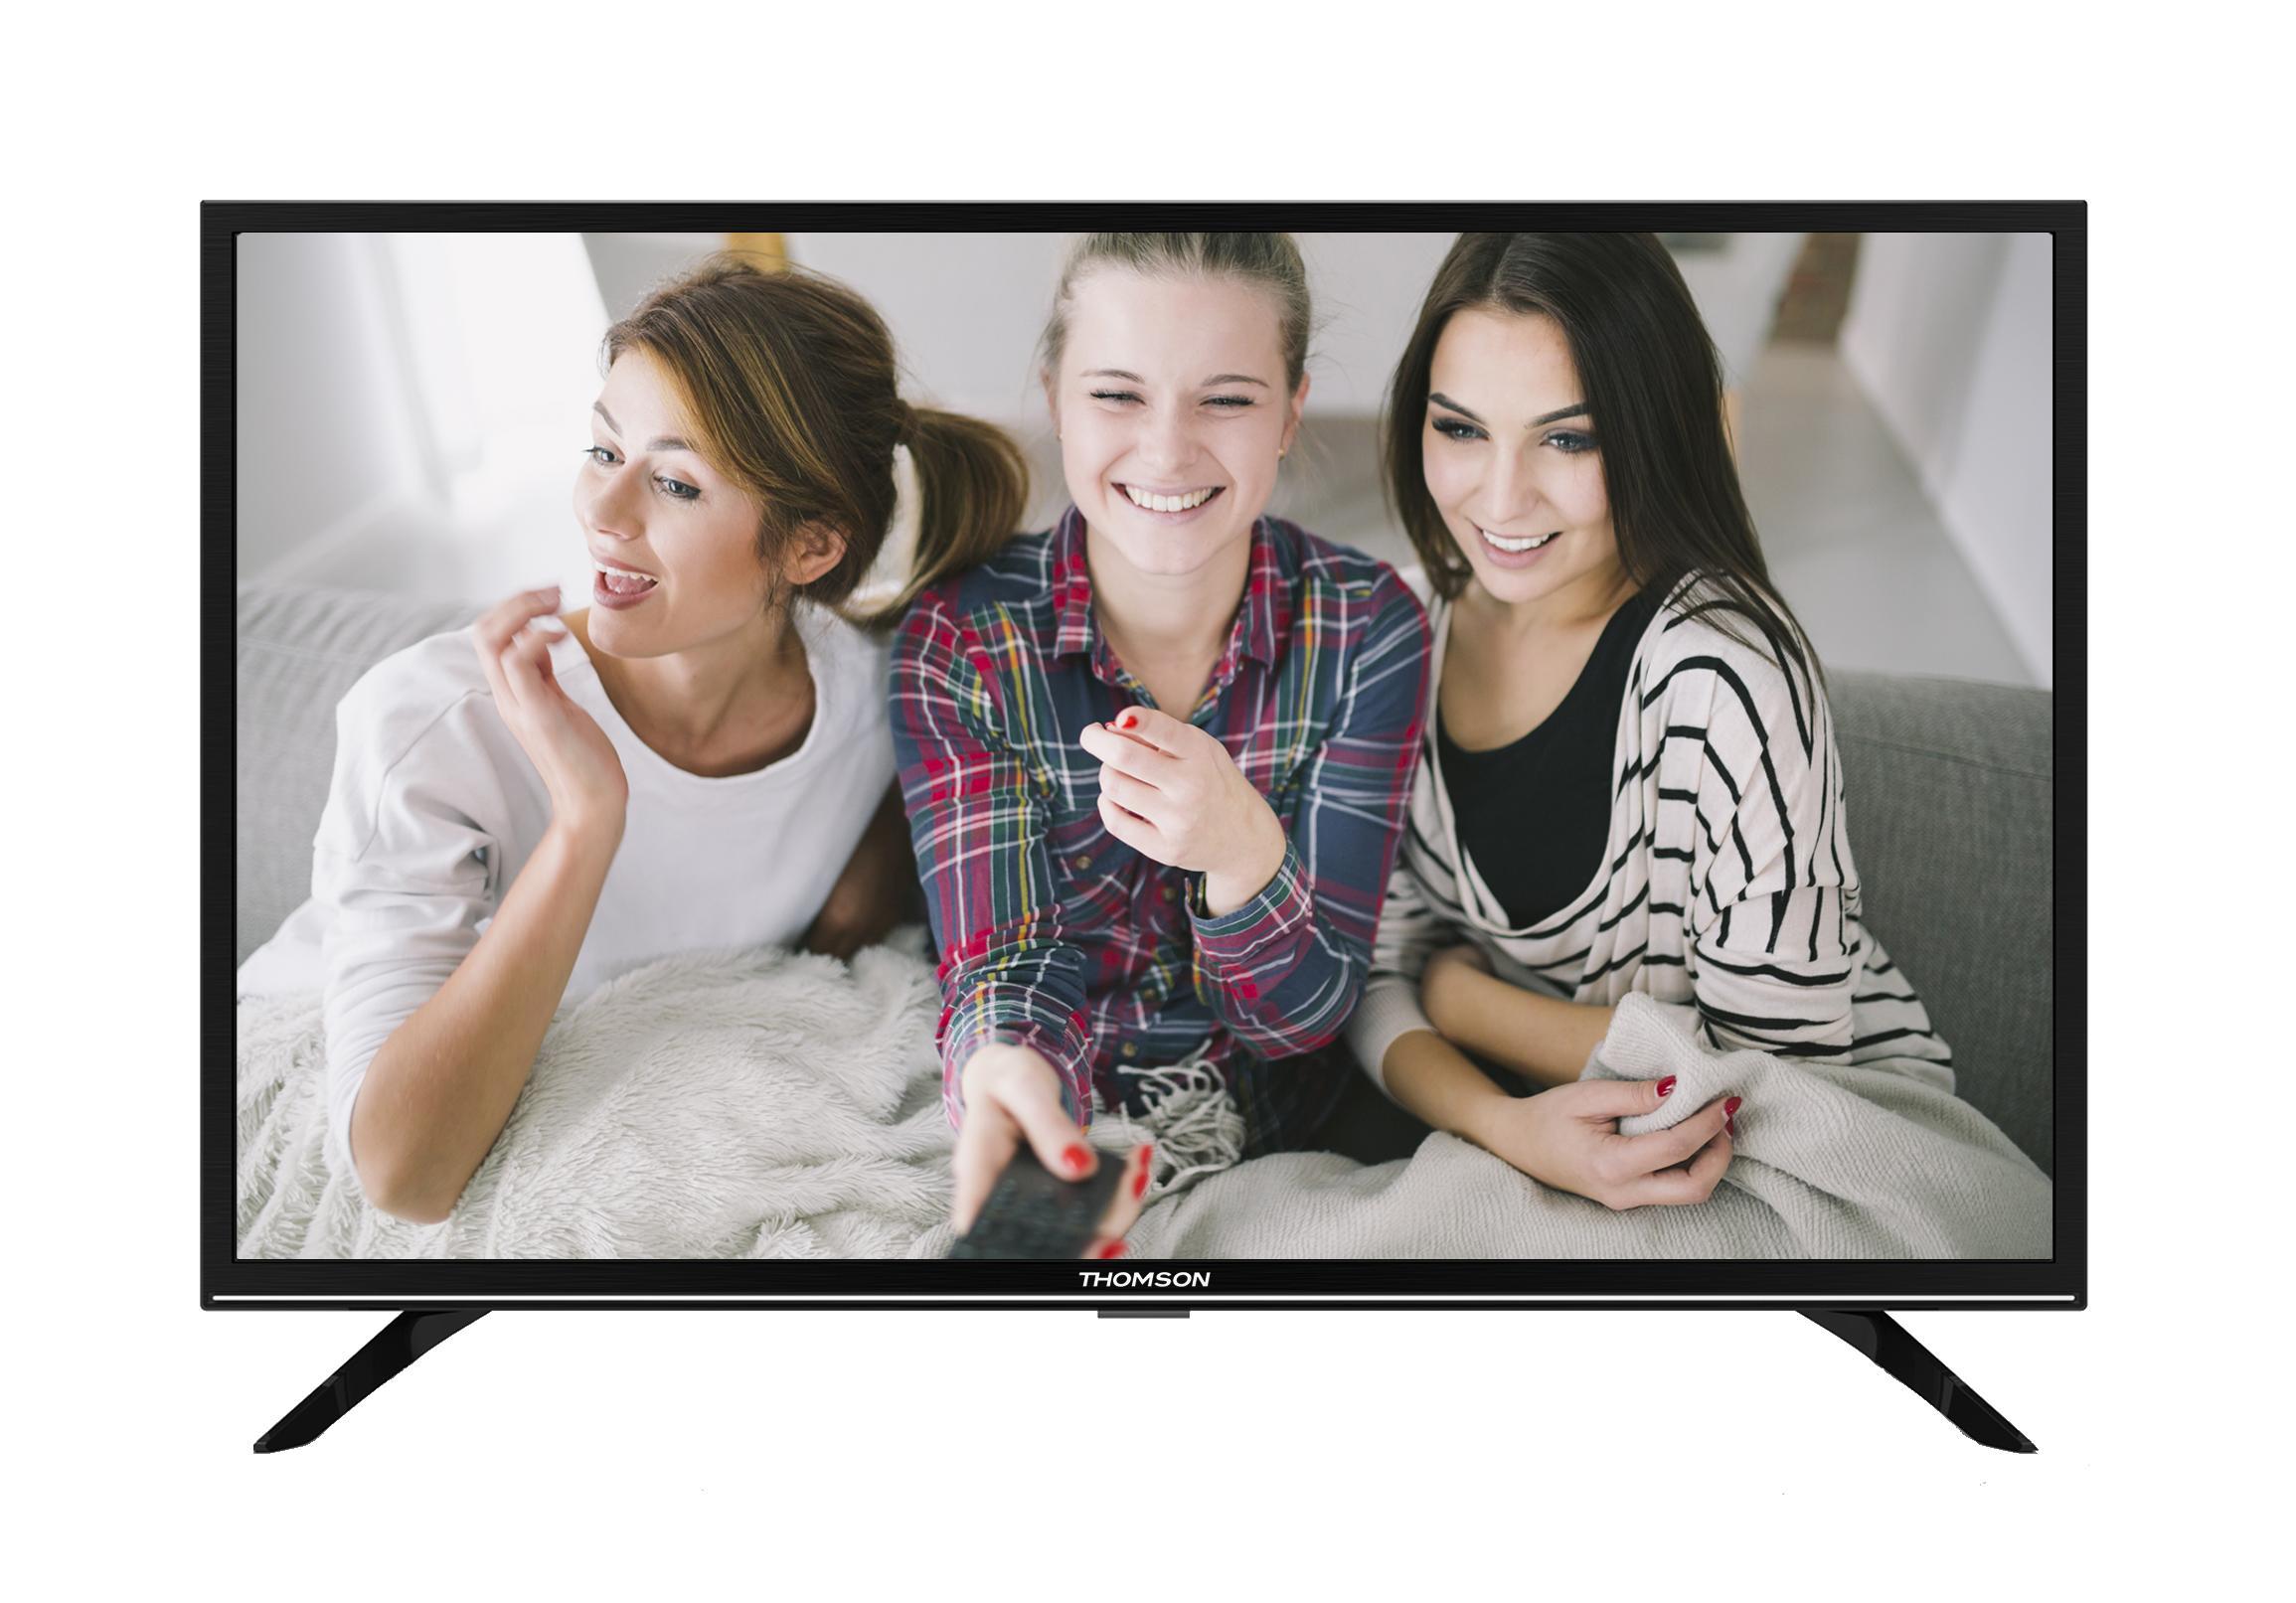 цена на Телевизор Thomson T32RTE1160 LED 32 Black, 16:9, 1366х768, 3 000:1, 260 кд/м2, USB, HDMI, DVB-T, T2, C